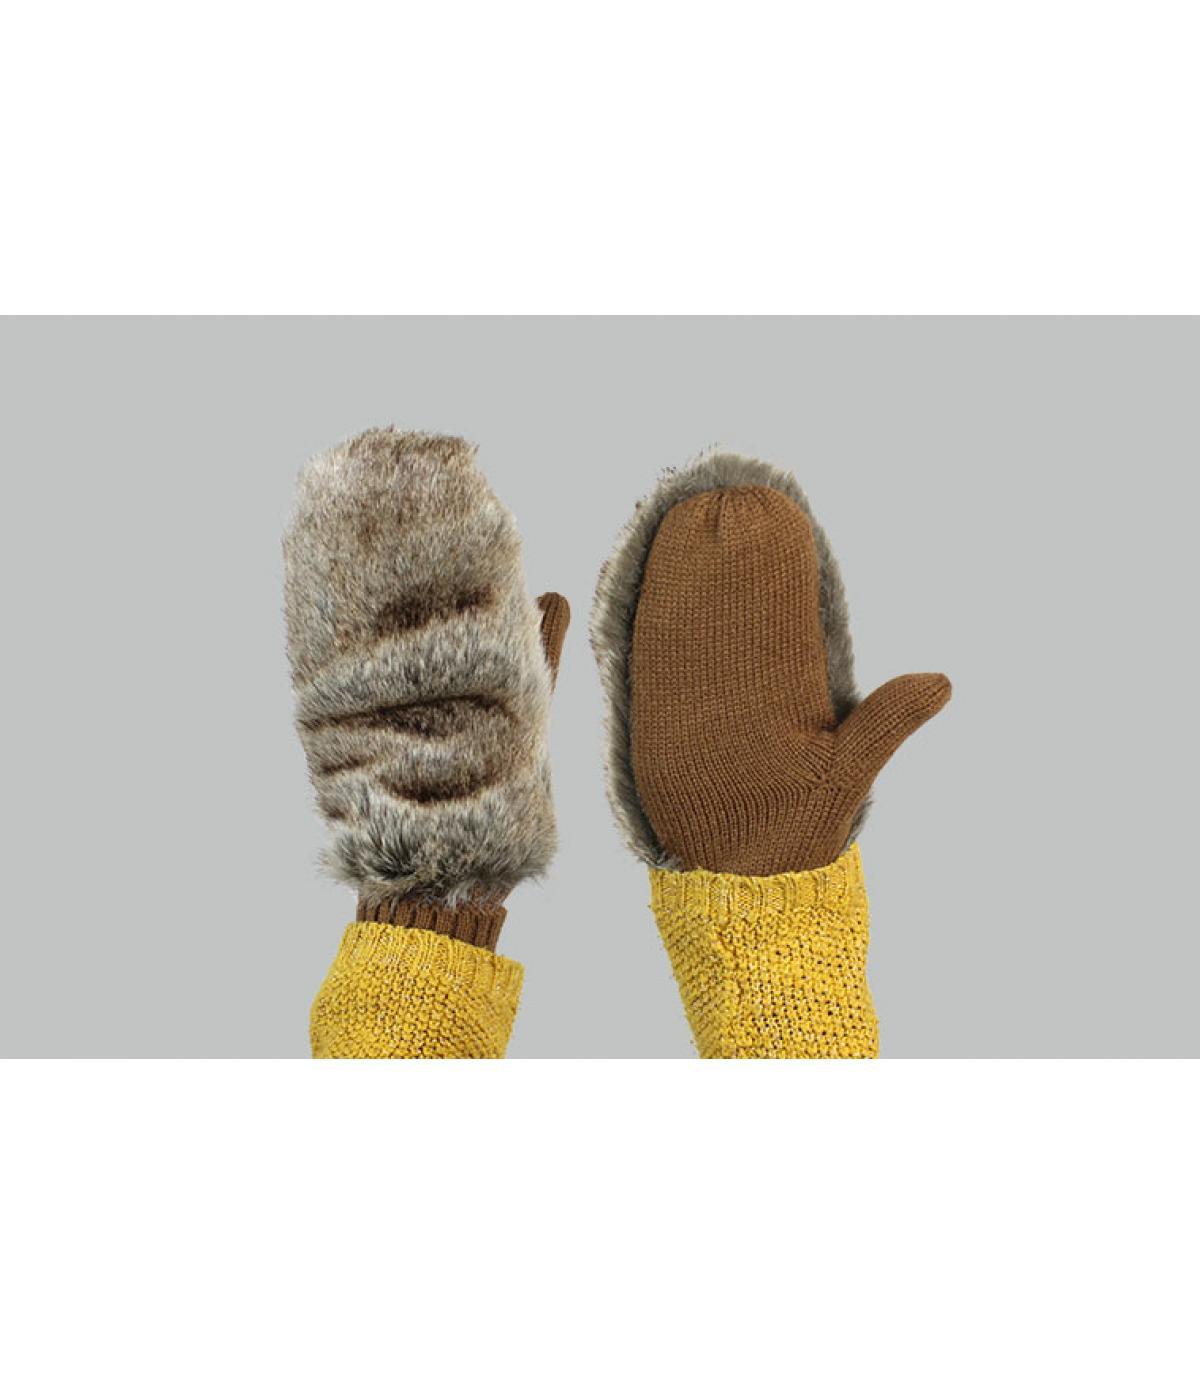 Fausthandschuh Kaninchen Barts